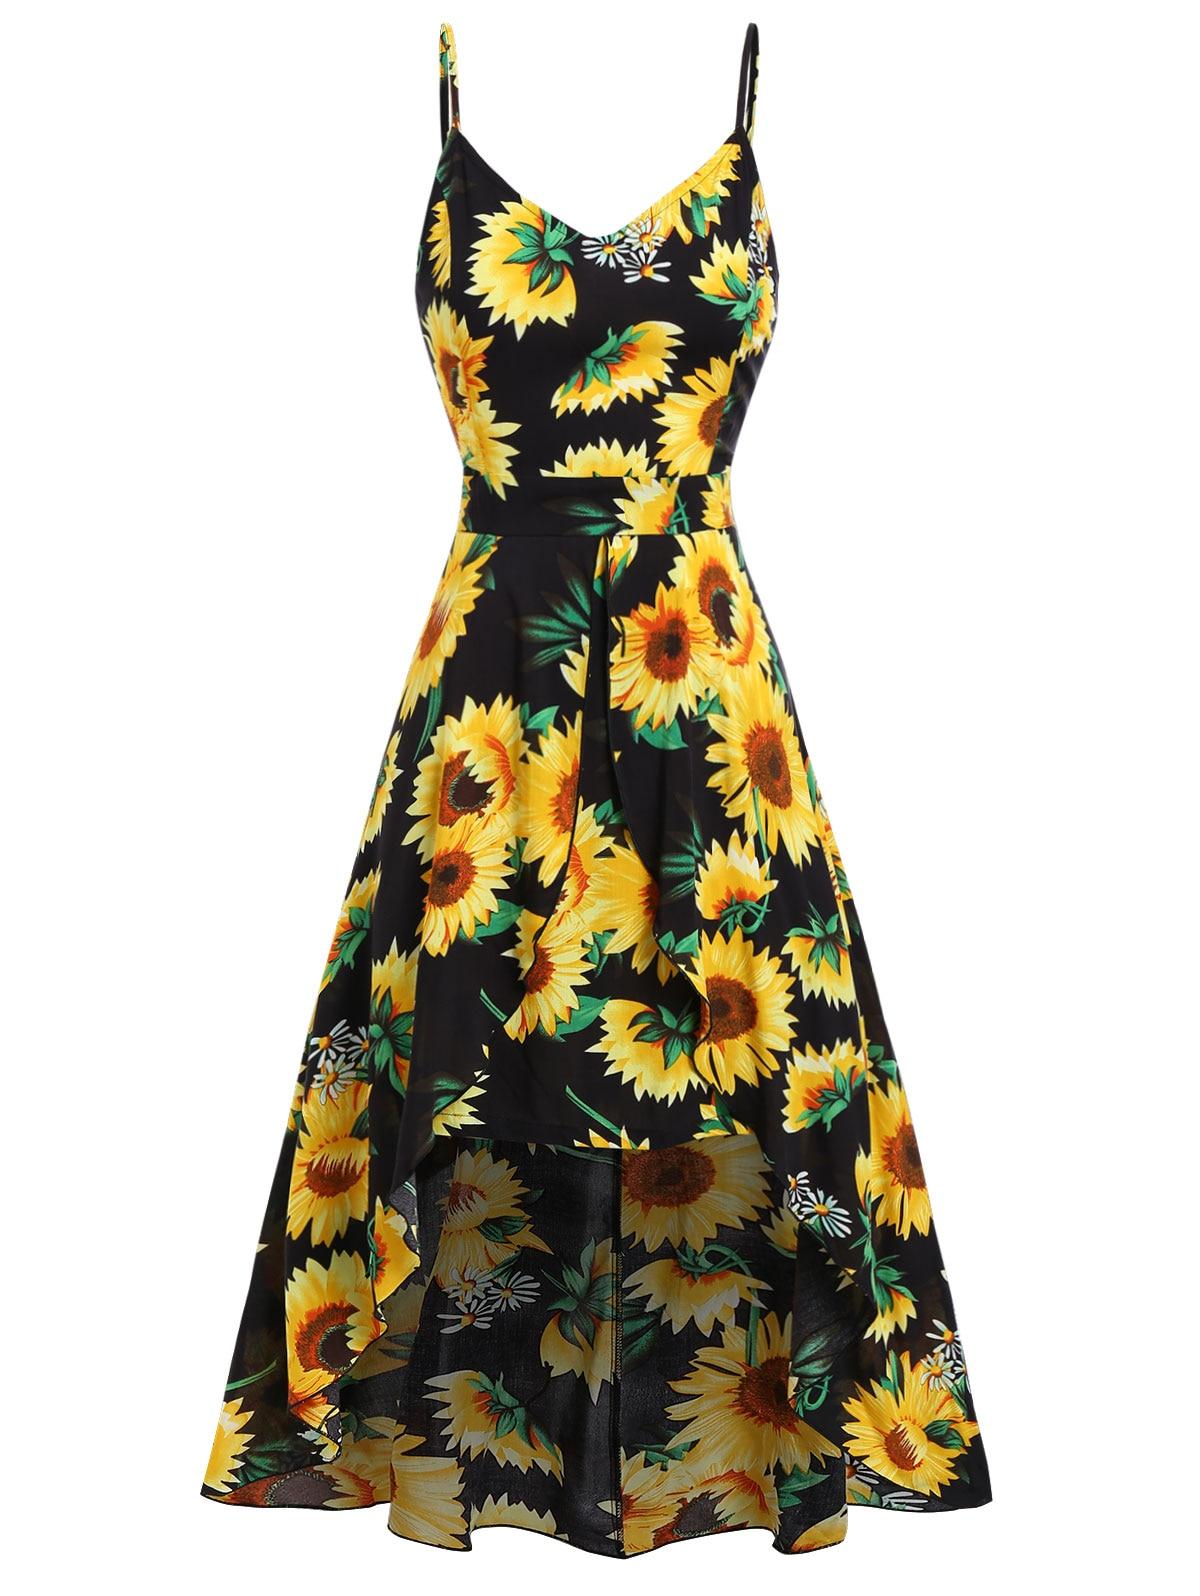 US $13.09 48% OFF|Wipalo Women Plus Size Sunflower Printed Cami Maxi Dress  Split High Low Hem Casual Holiday Dress Ladies Summer Beach Vestidos-in ...